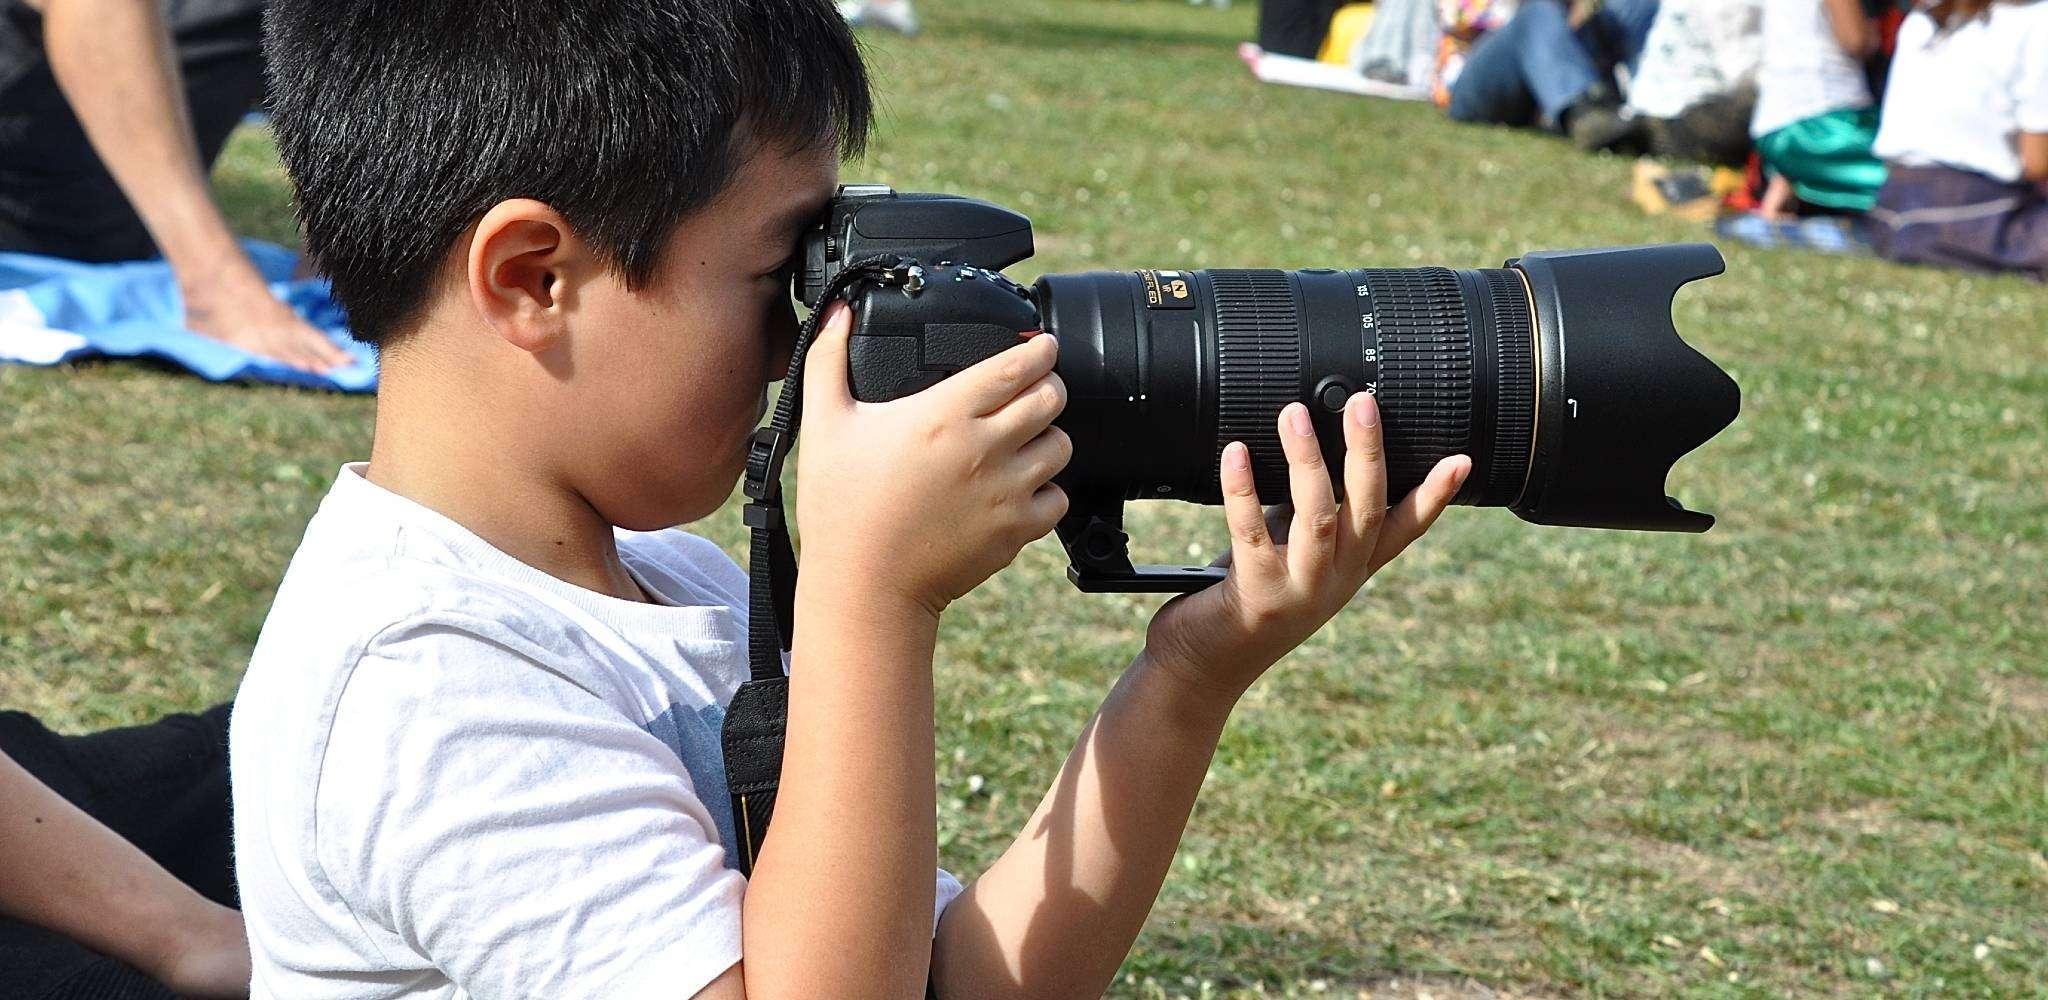 Thai boy with Dad's camera